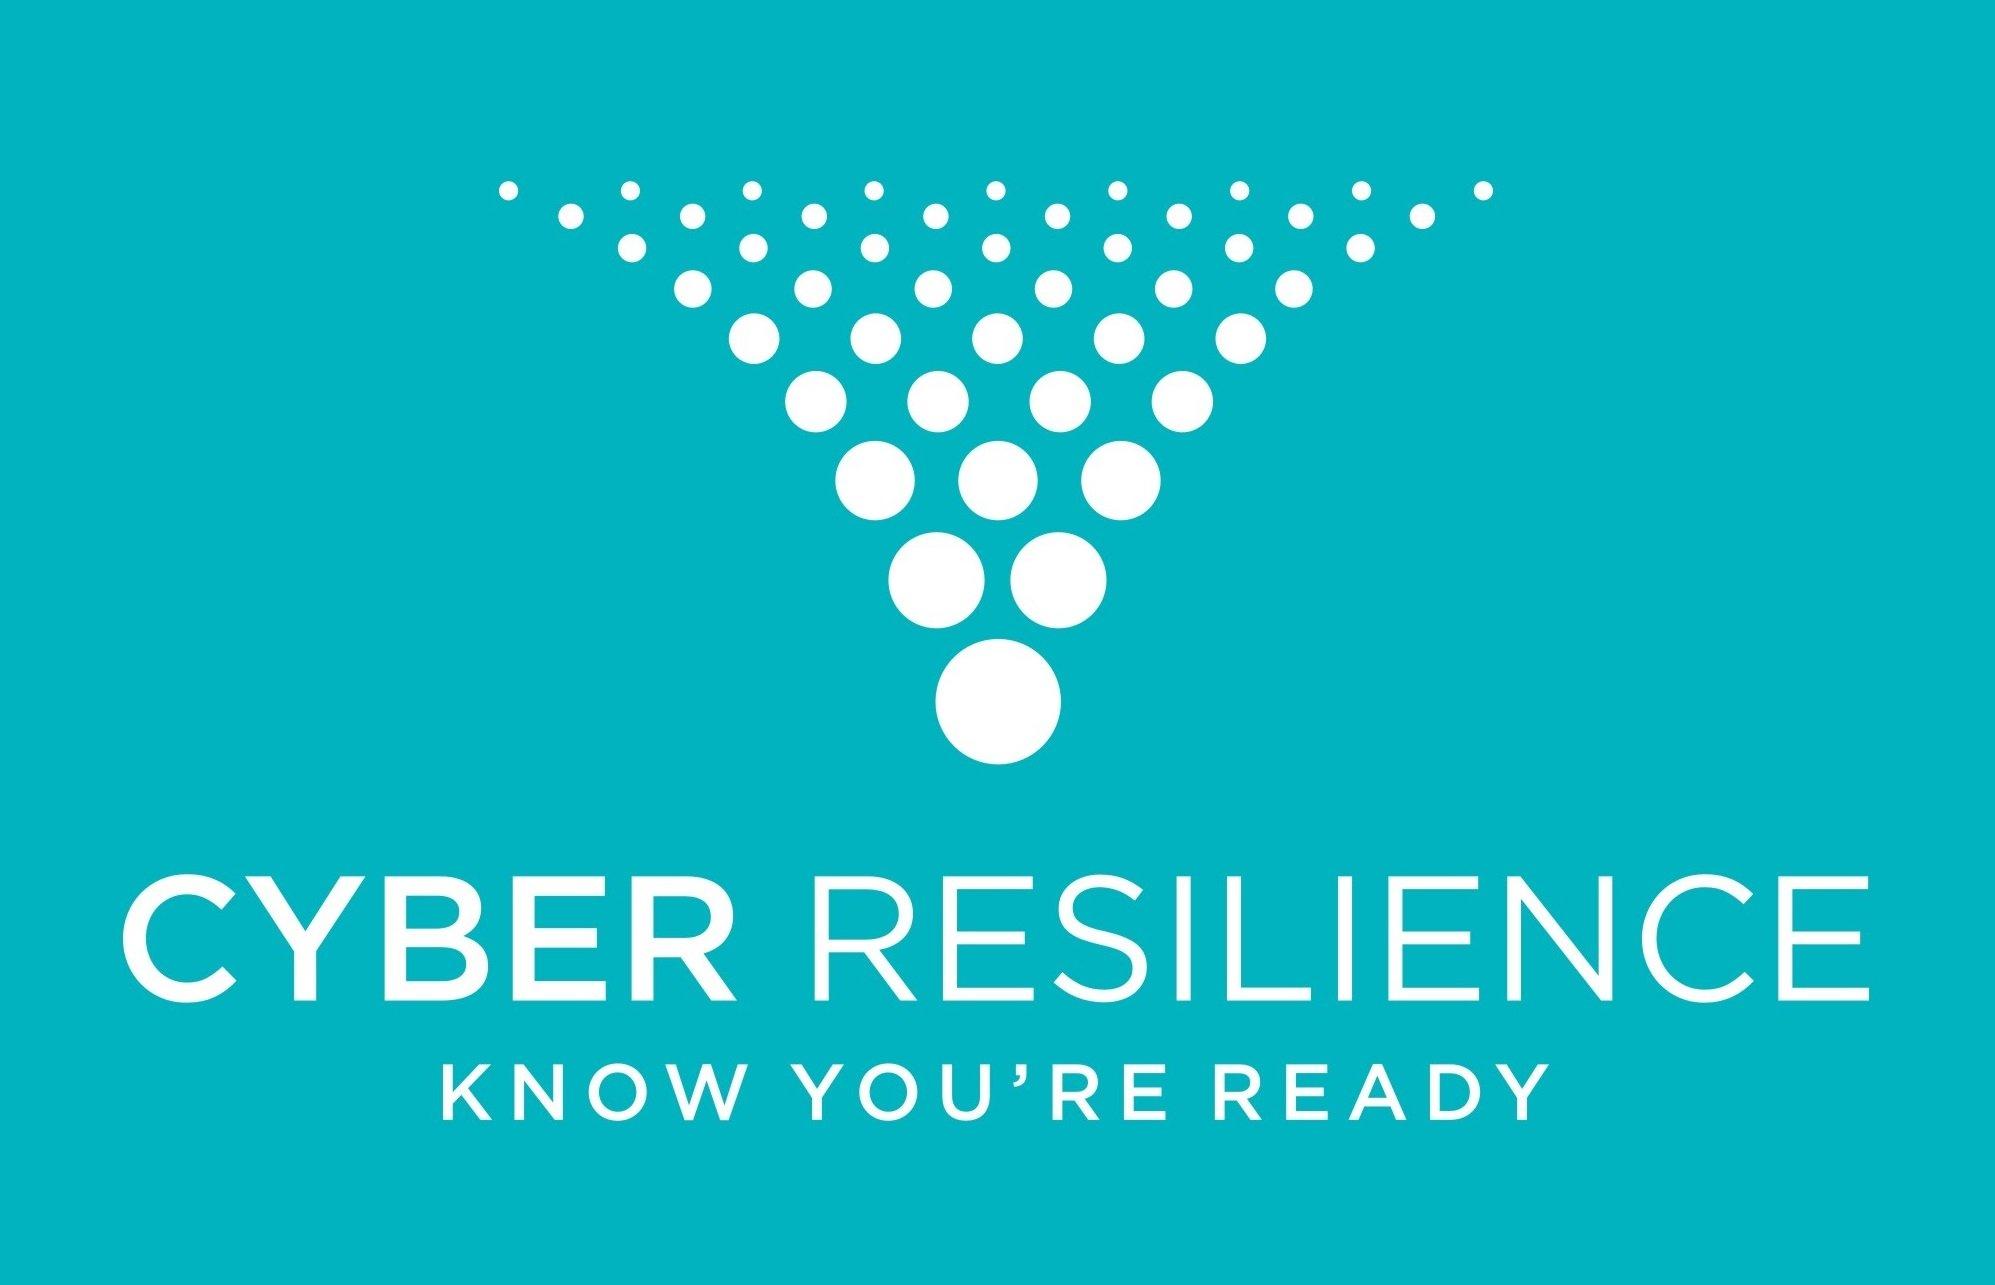 سمینار Cyber Resilience